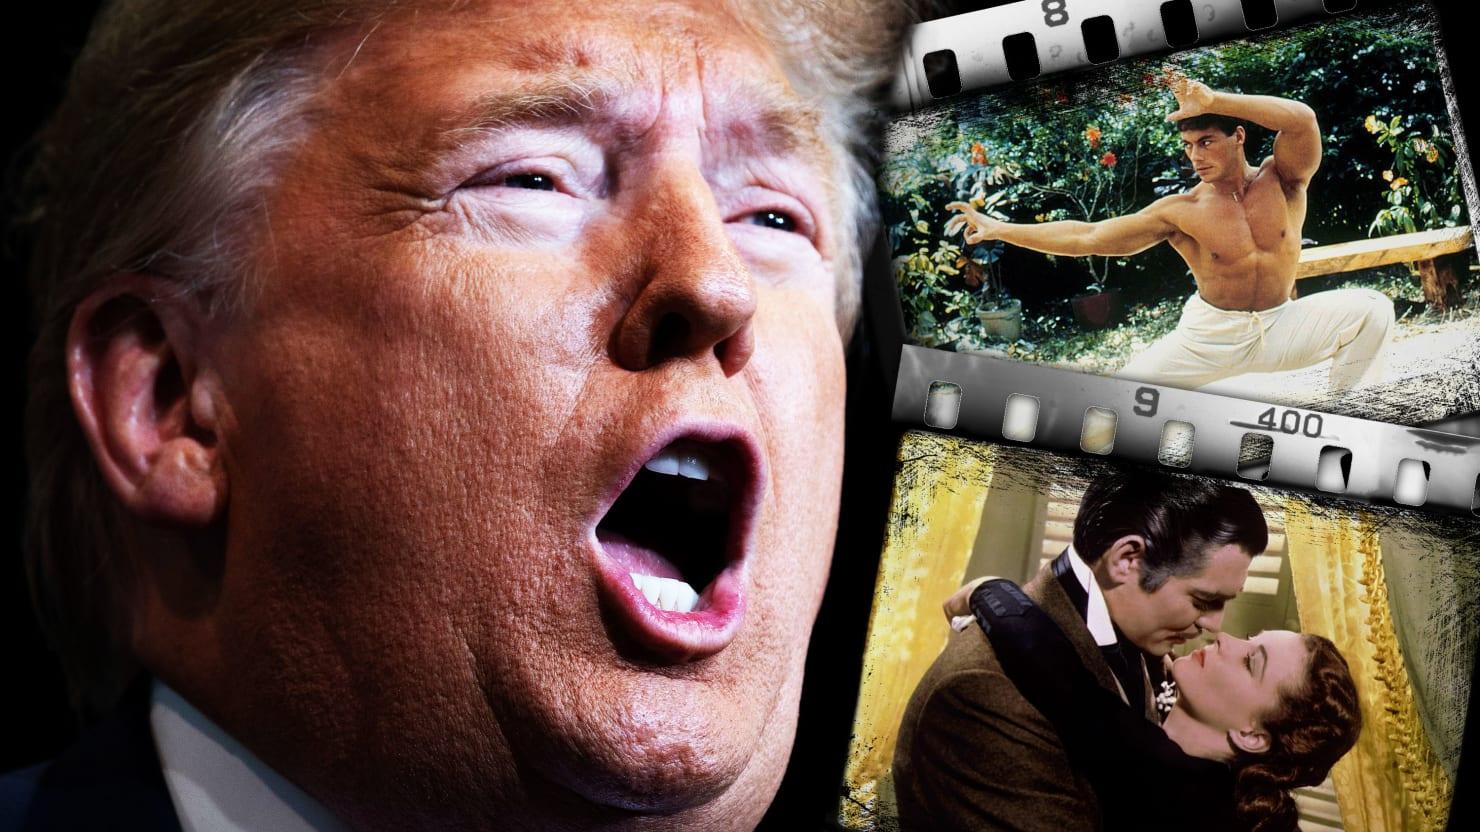 Trump Has the Absolute Worst Taste in Movies